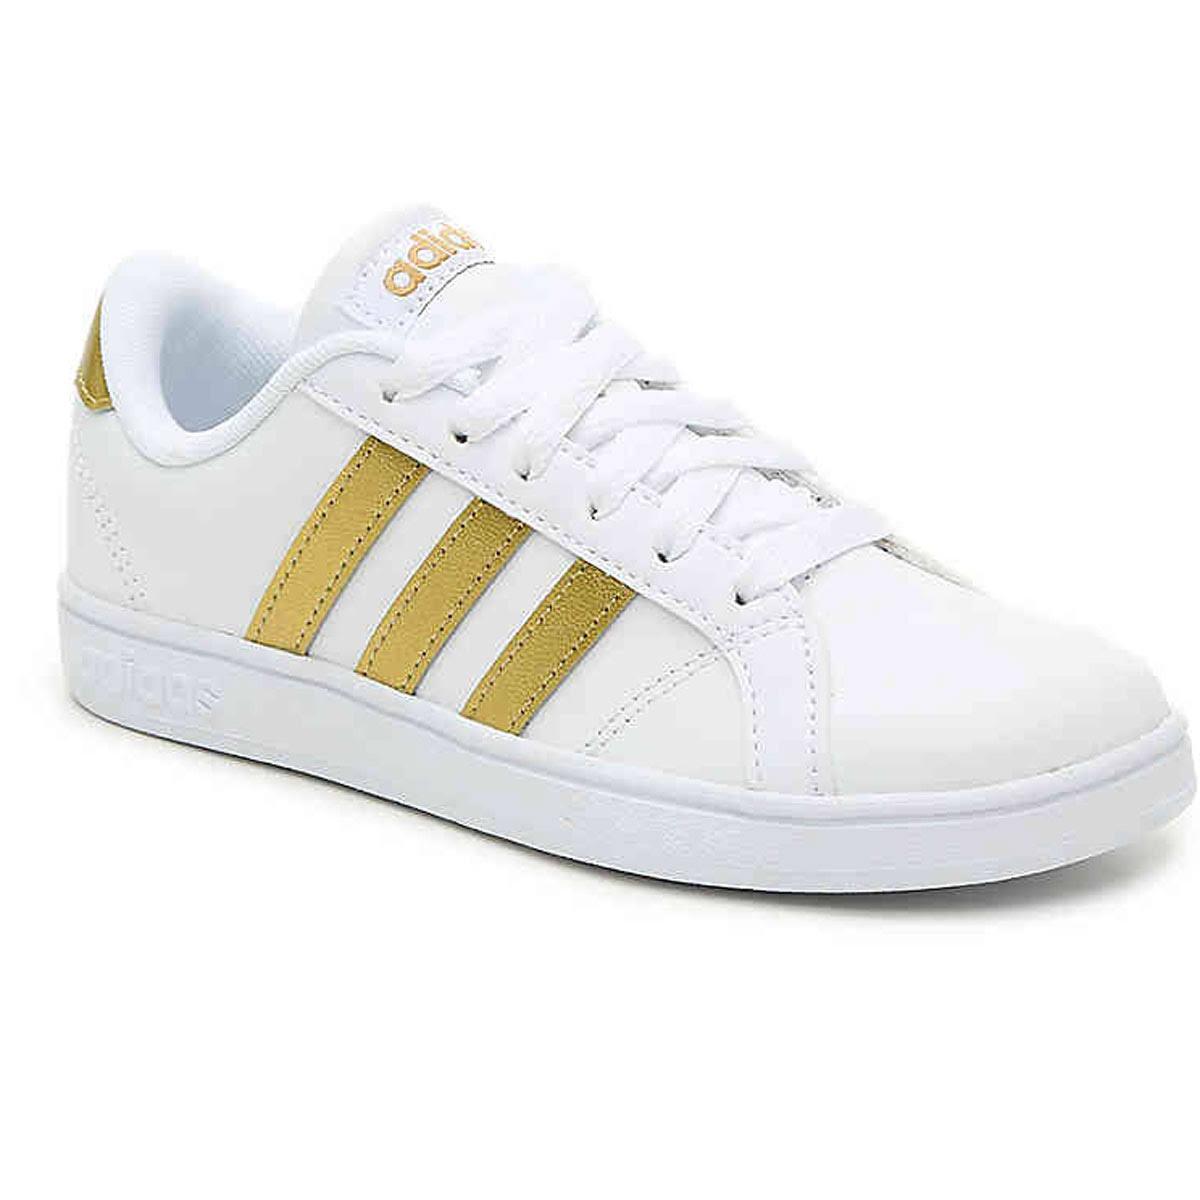 Adidas Kid's Cg5844 Adidas Sneakers Baseline Sneakers Kid's Baseline Adidas Cg5844 qrFq6Hw1O